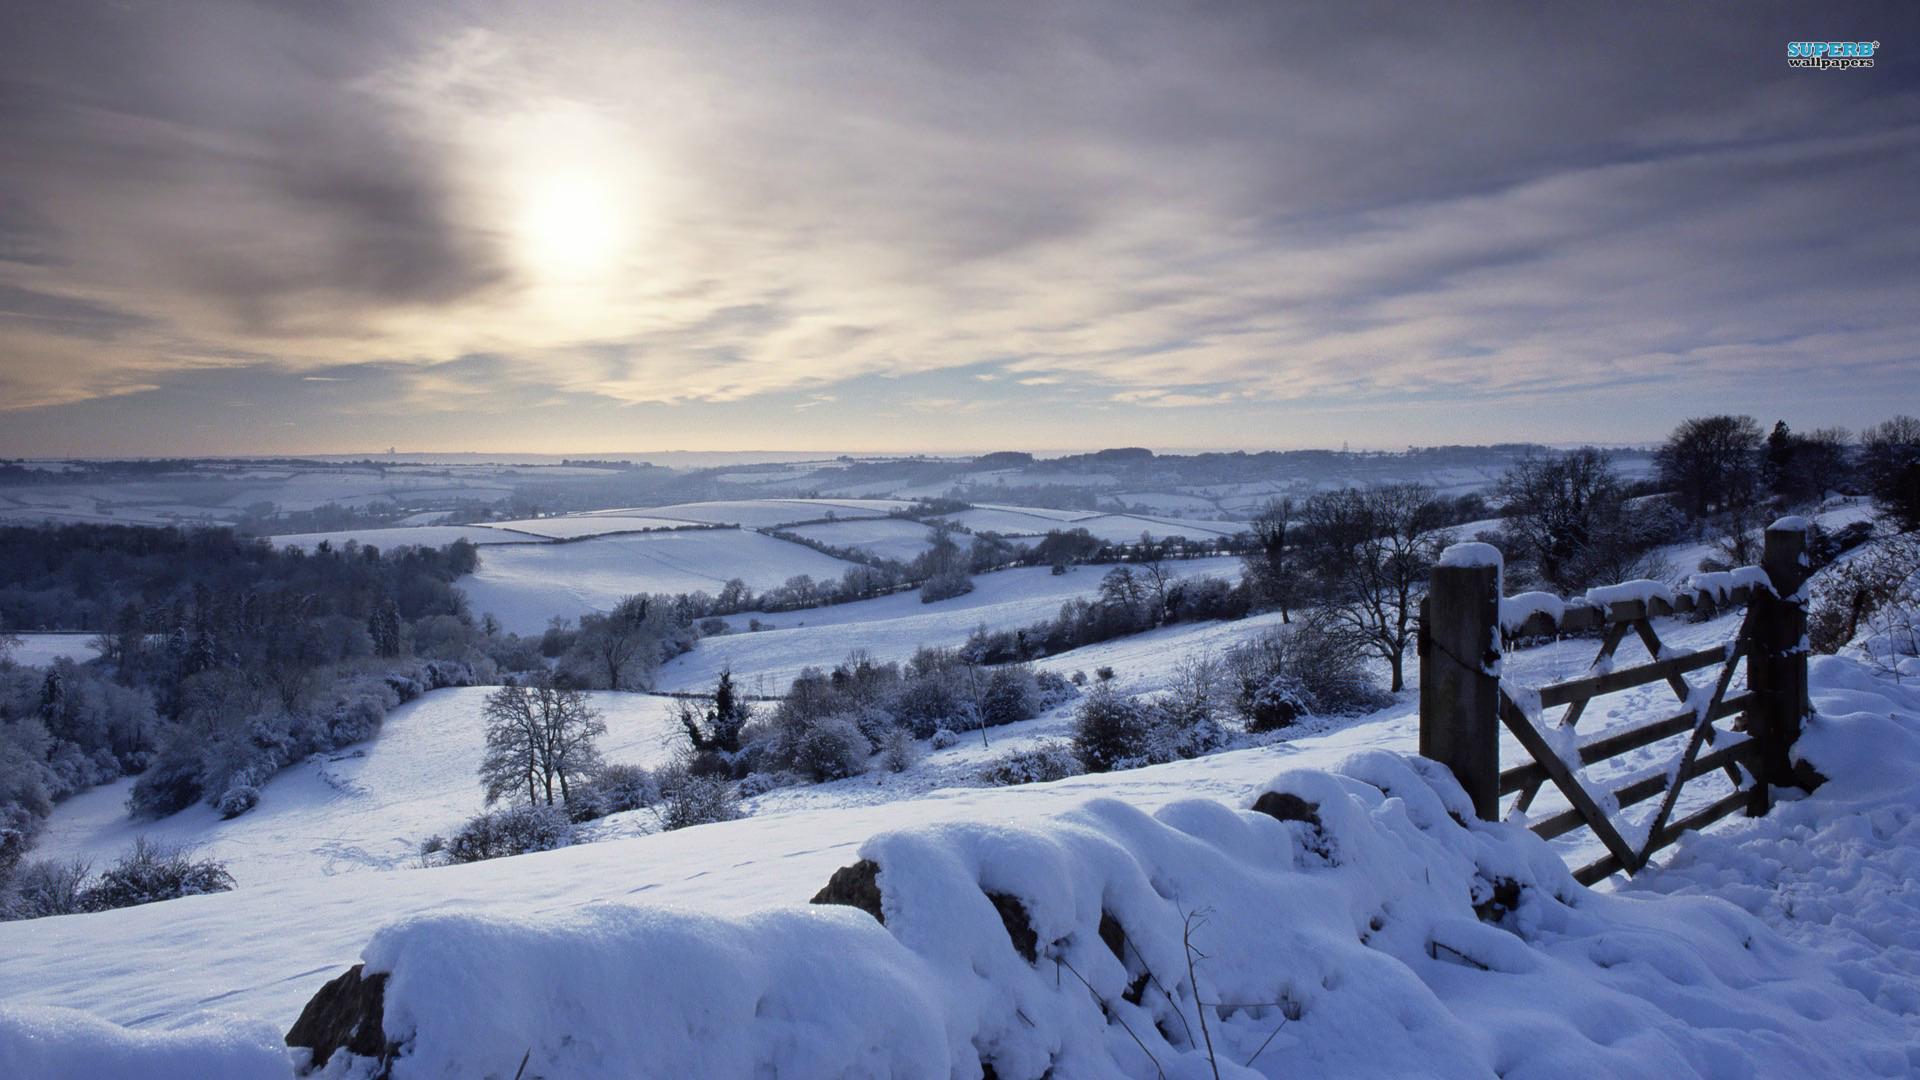 72 Winter Landscape Wallpapers On Wallpapersafari